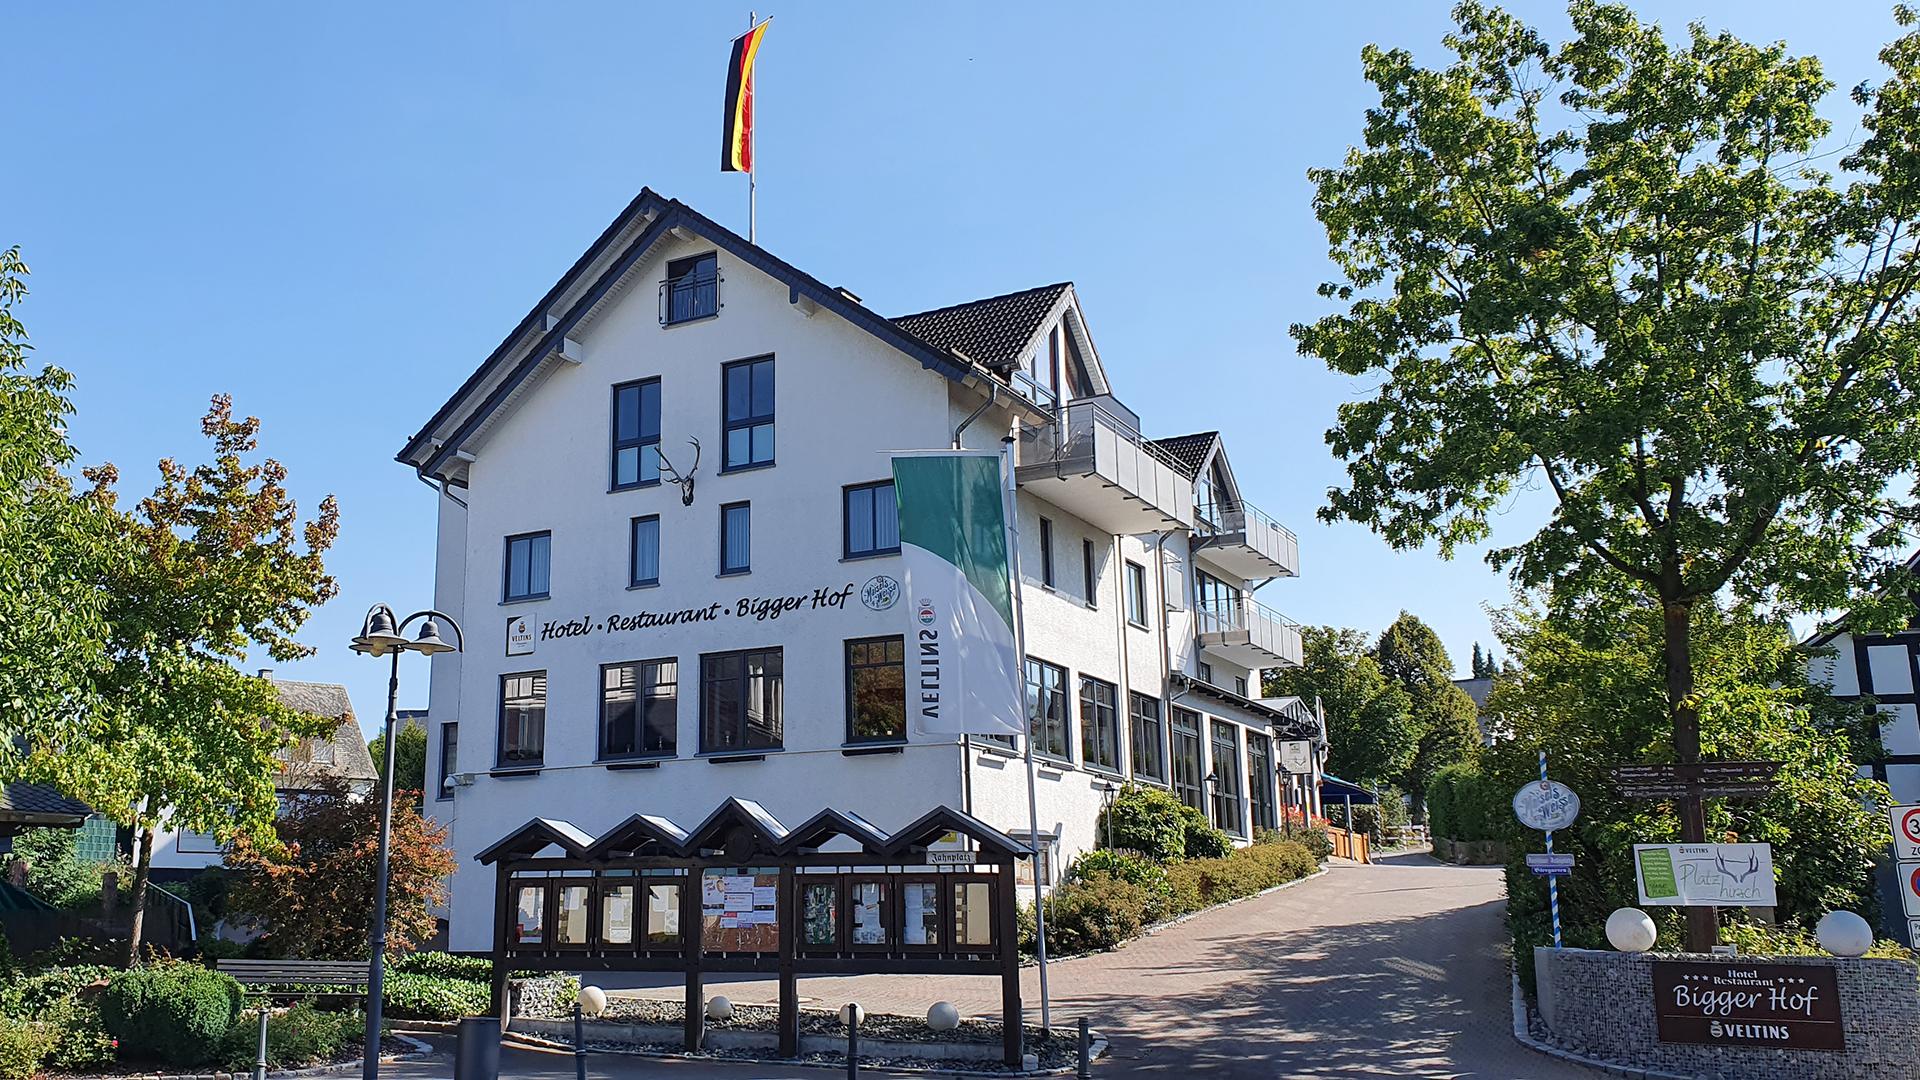 Hotel Bigger Hof Jahnplatz   Olsberg Deutschland